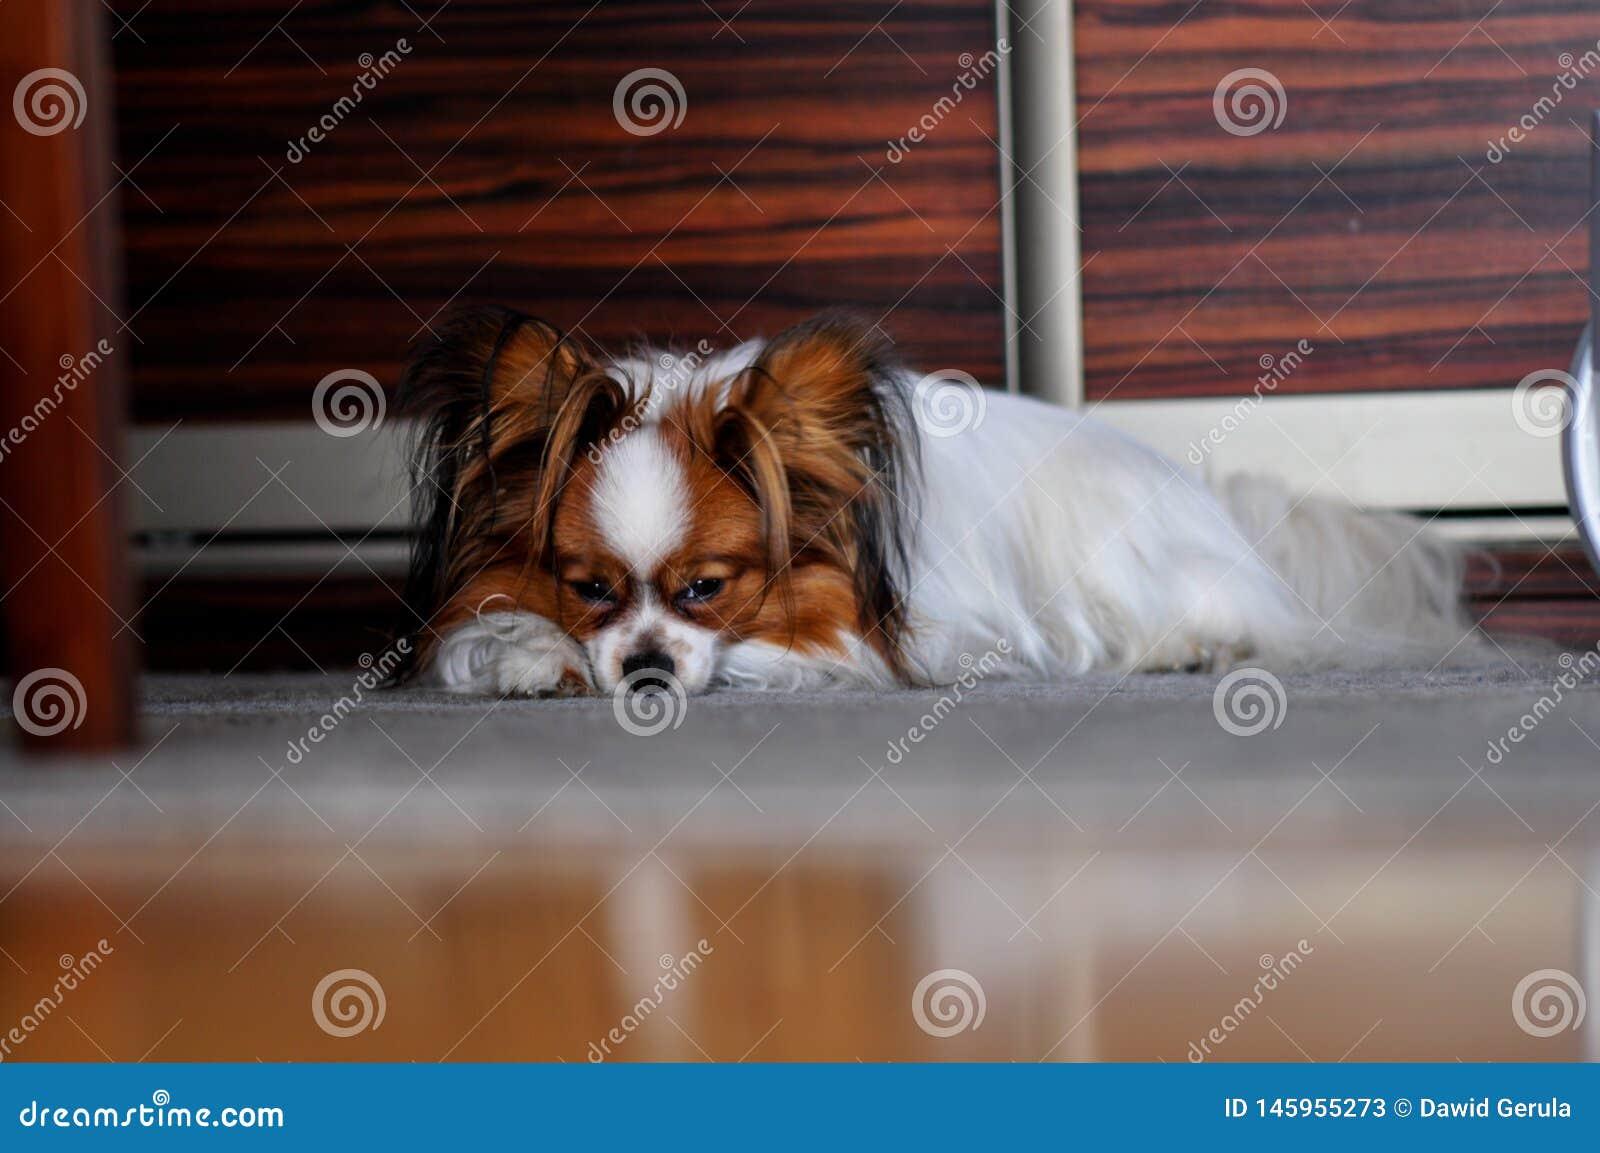 Papillon dog sleeping on the carpet